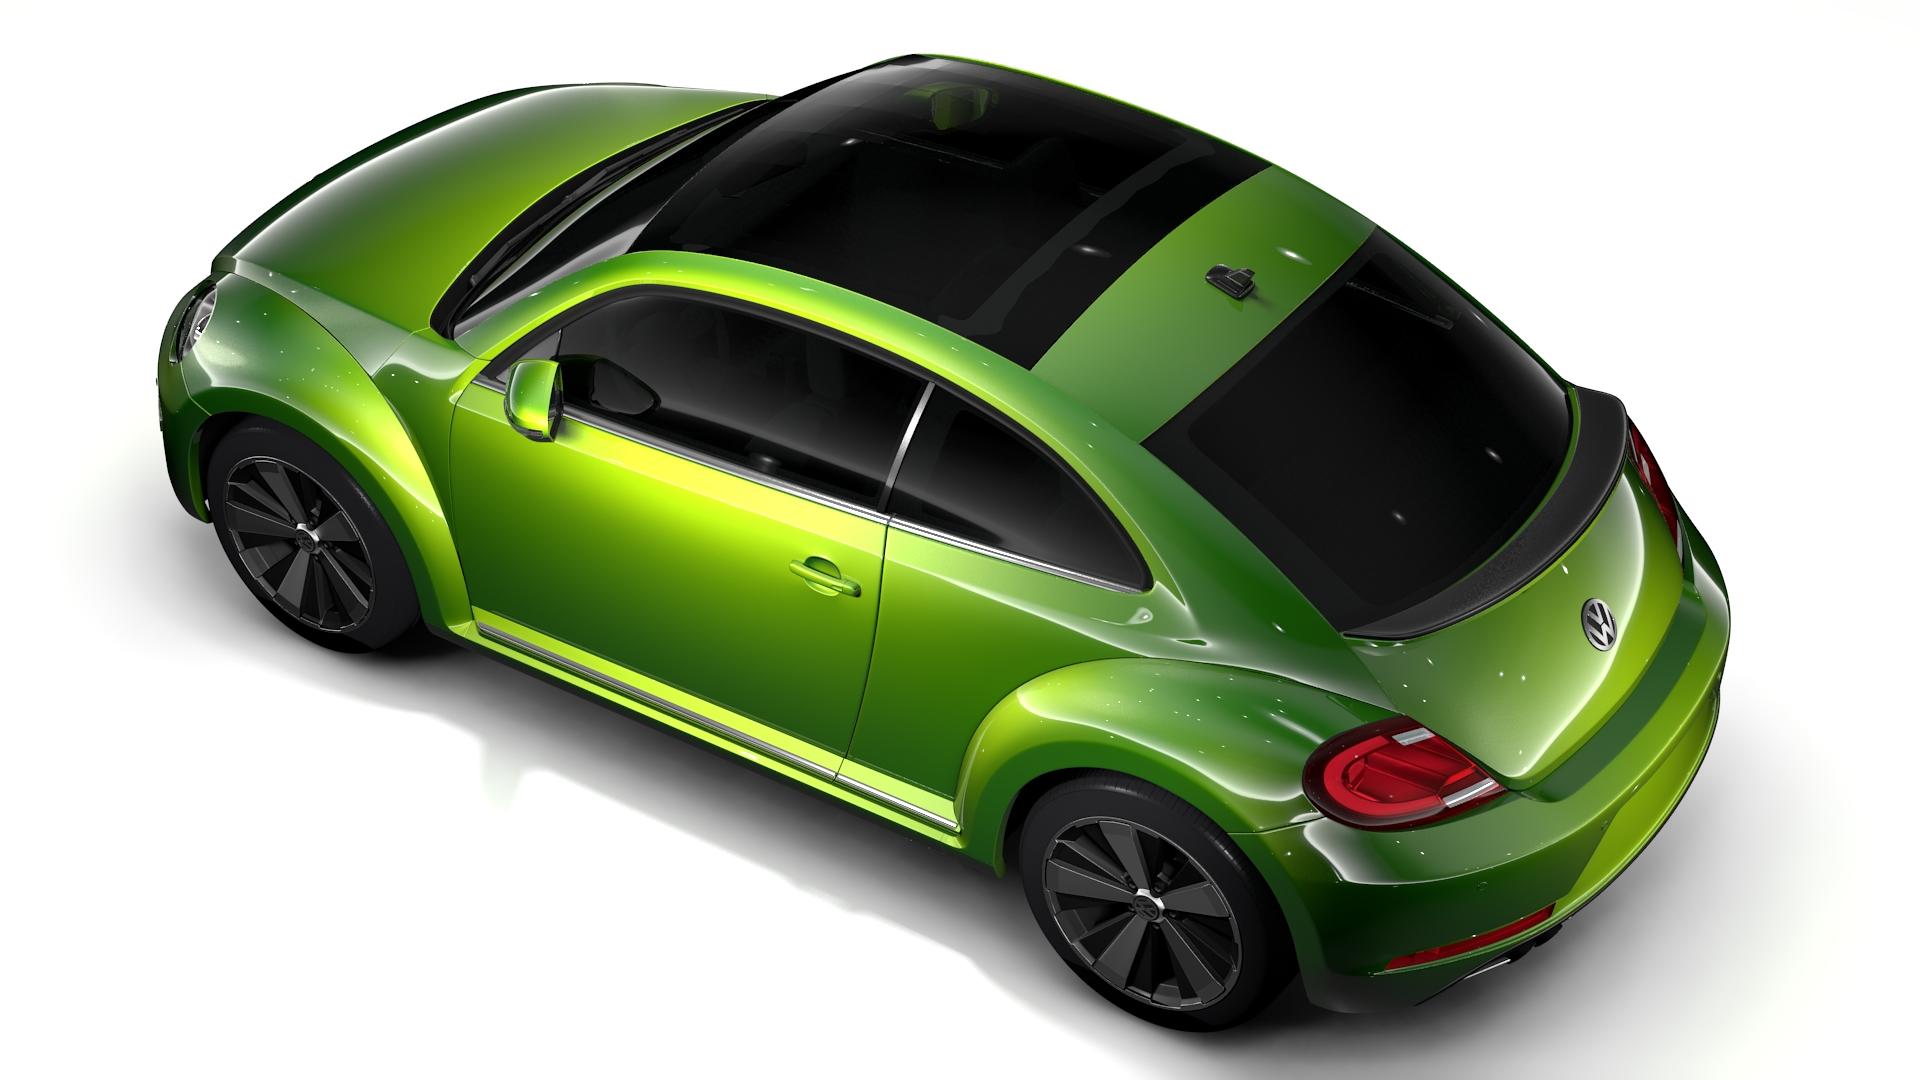 vw beetle 2017 3d model 3ds max fbx c4d lwo ma mb hrc xsi obj 221573